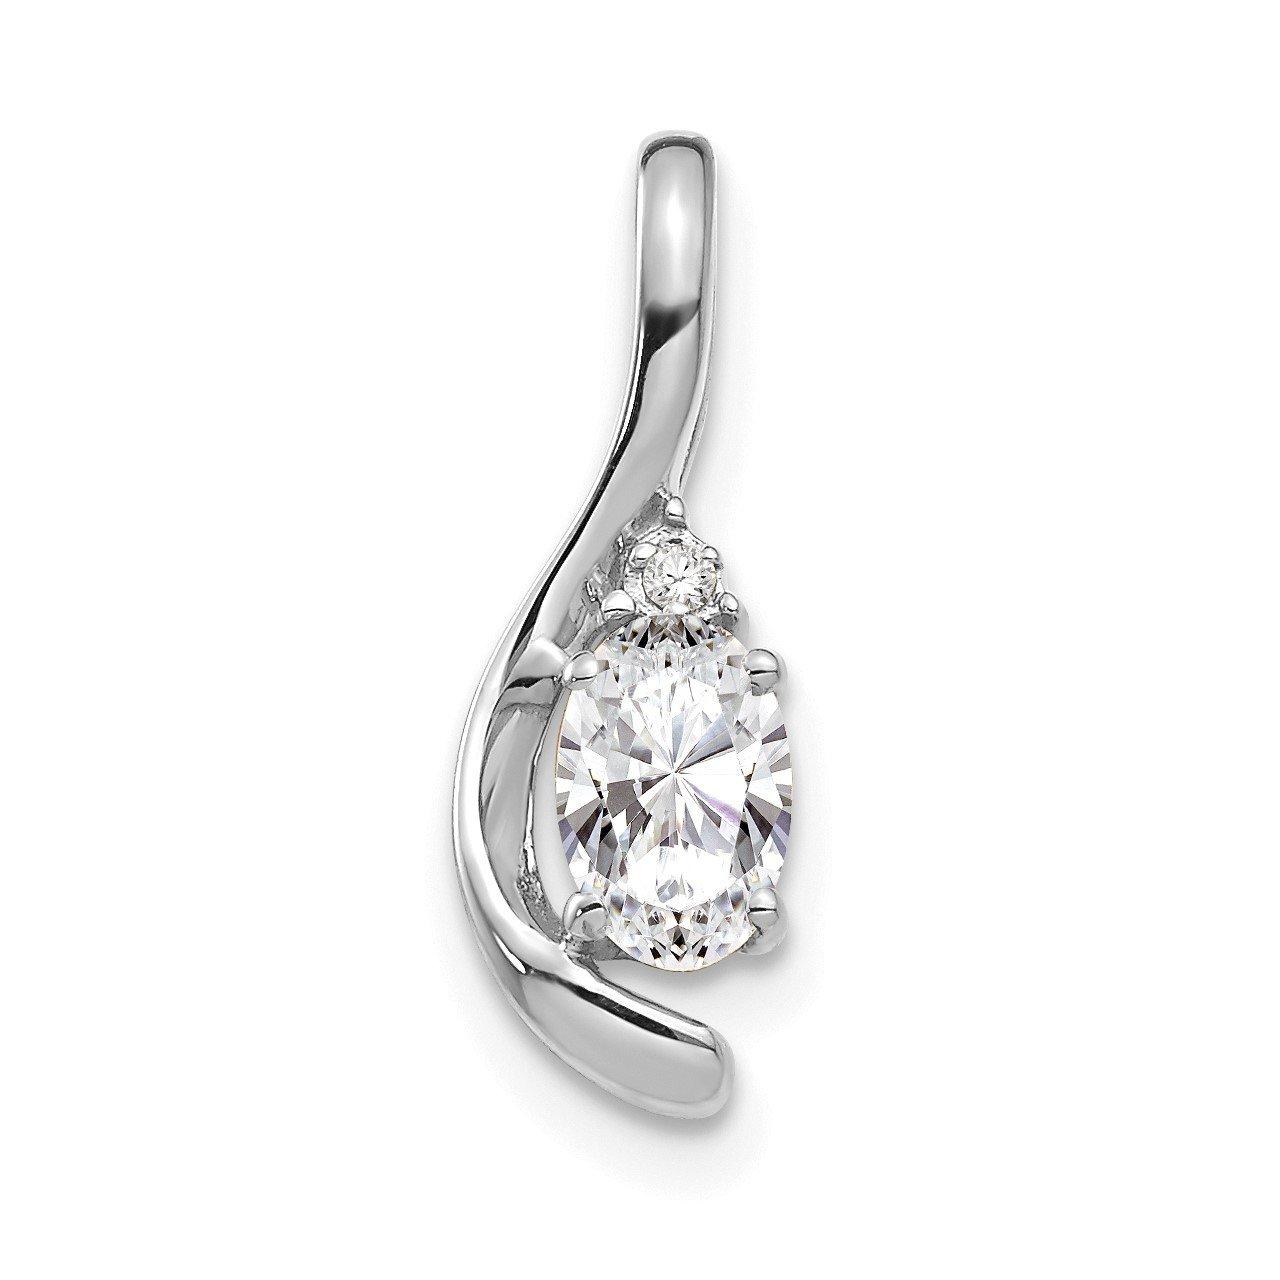 14k White Gold White Topaz and Diamond Pendant